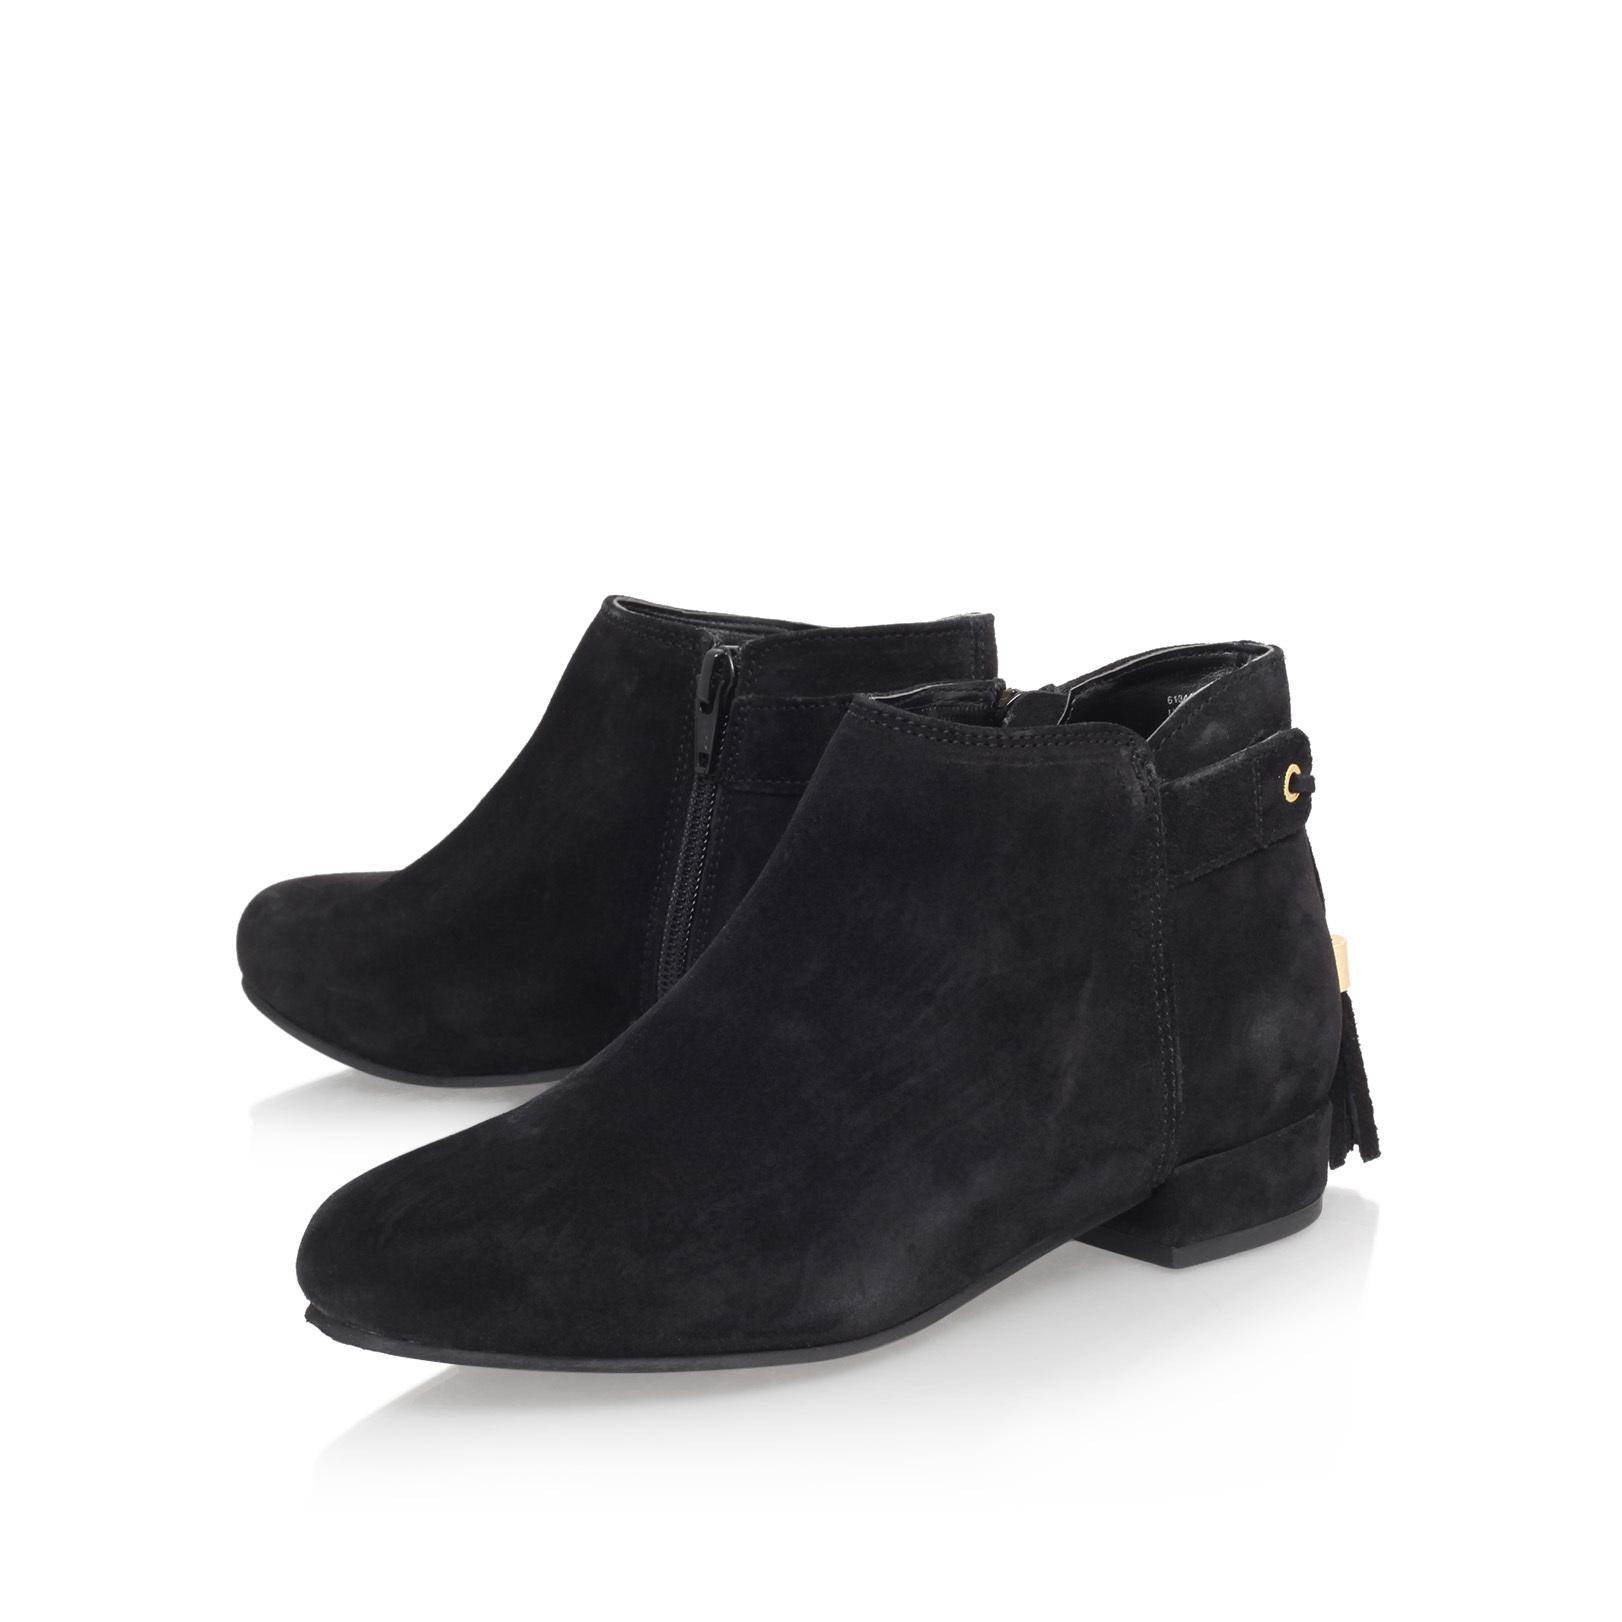 Carvela Kurt Geiger Leather Tassel Flat Ankle Boots in Black